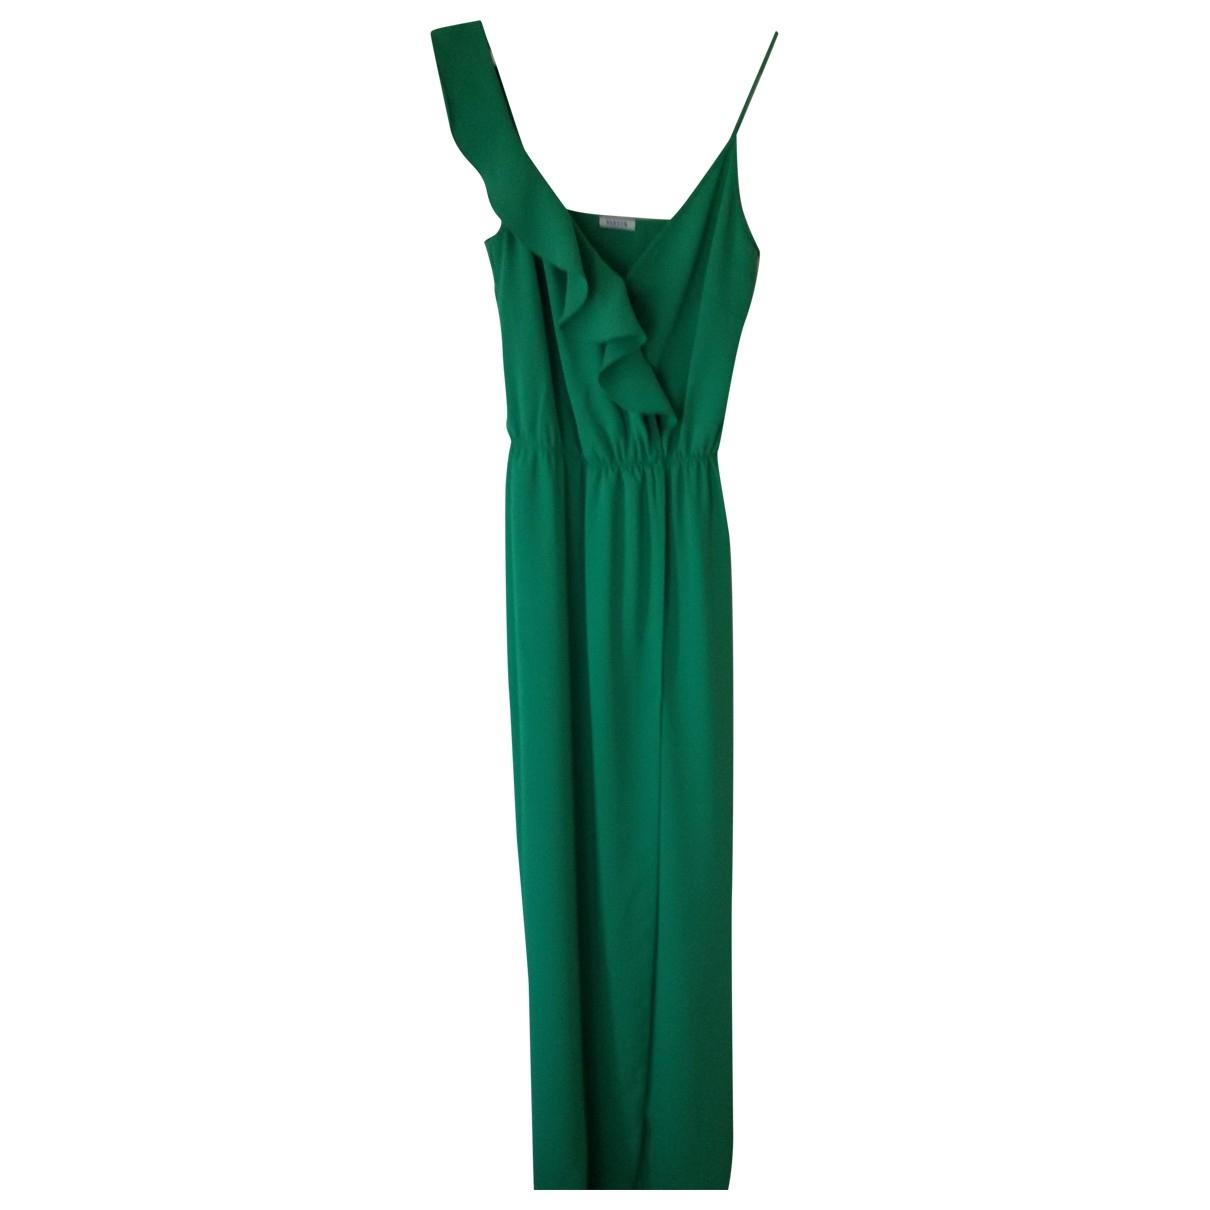 Parosh \N Green dress for Women 42 IT